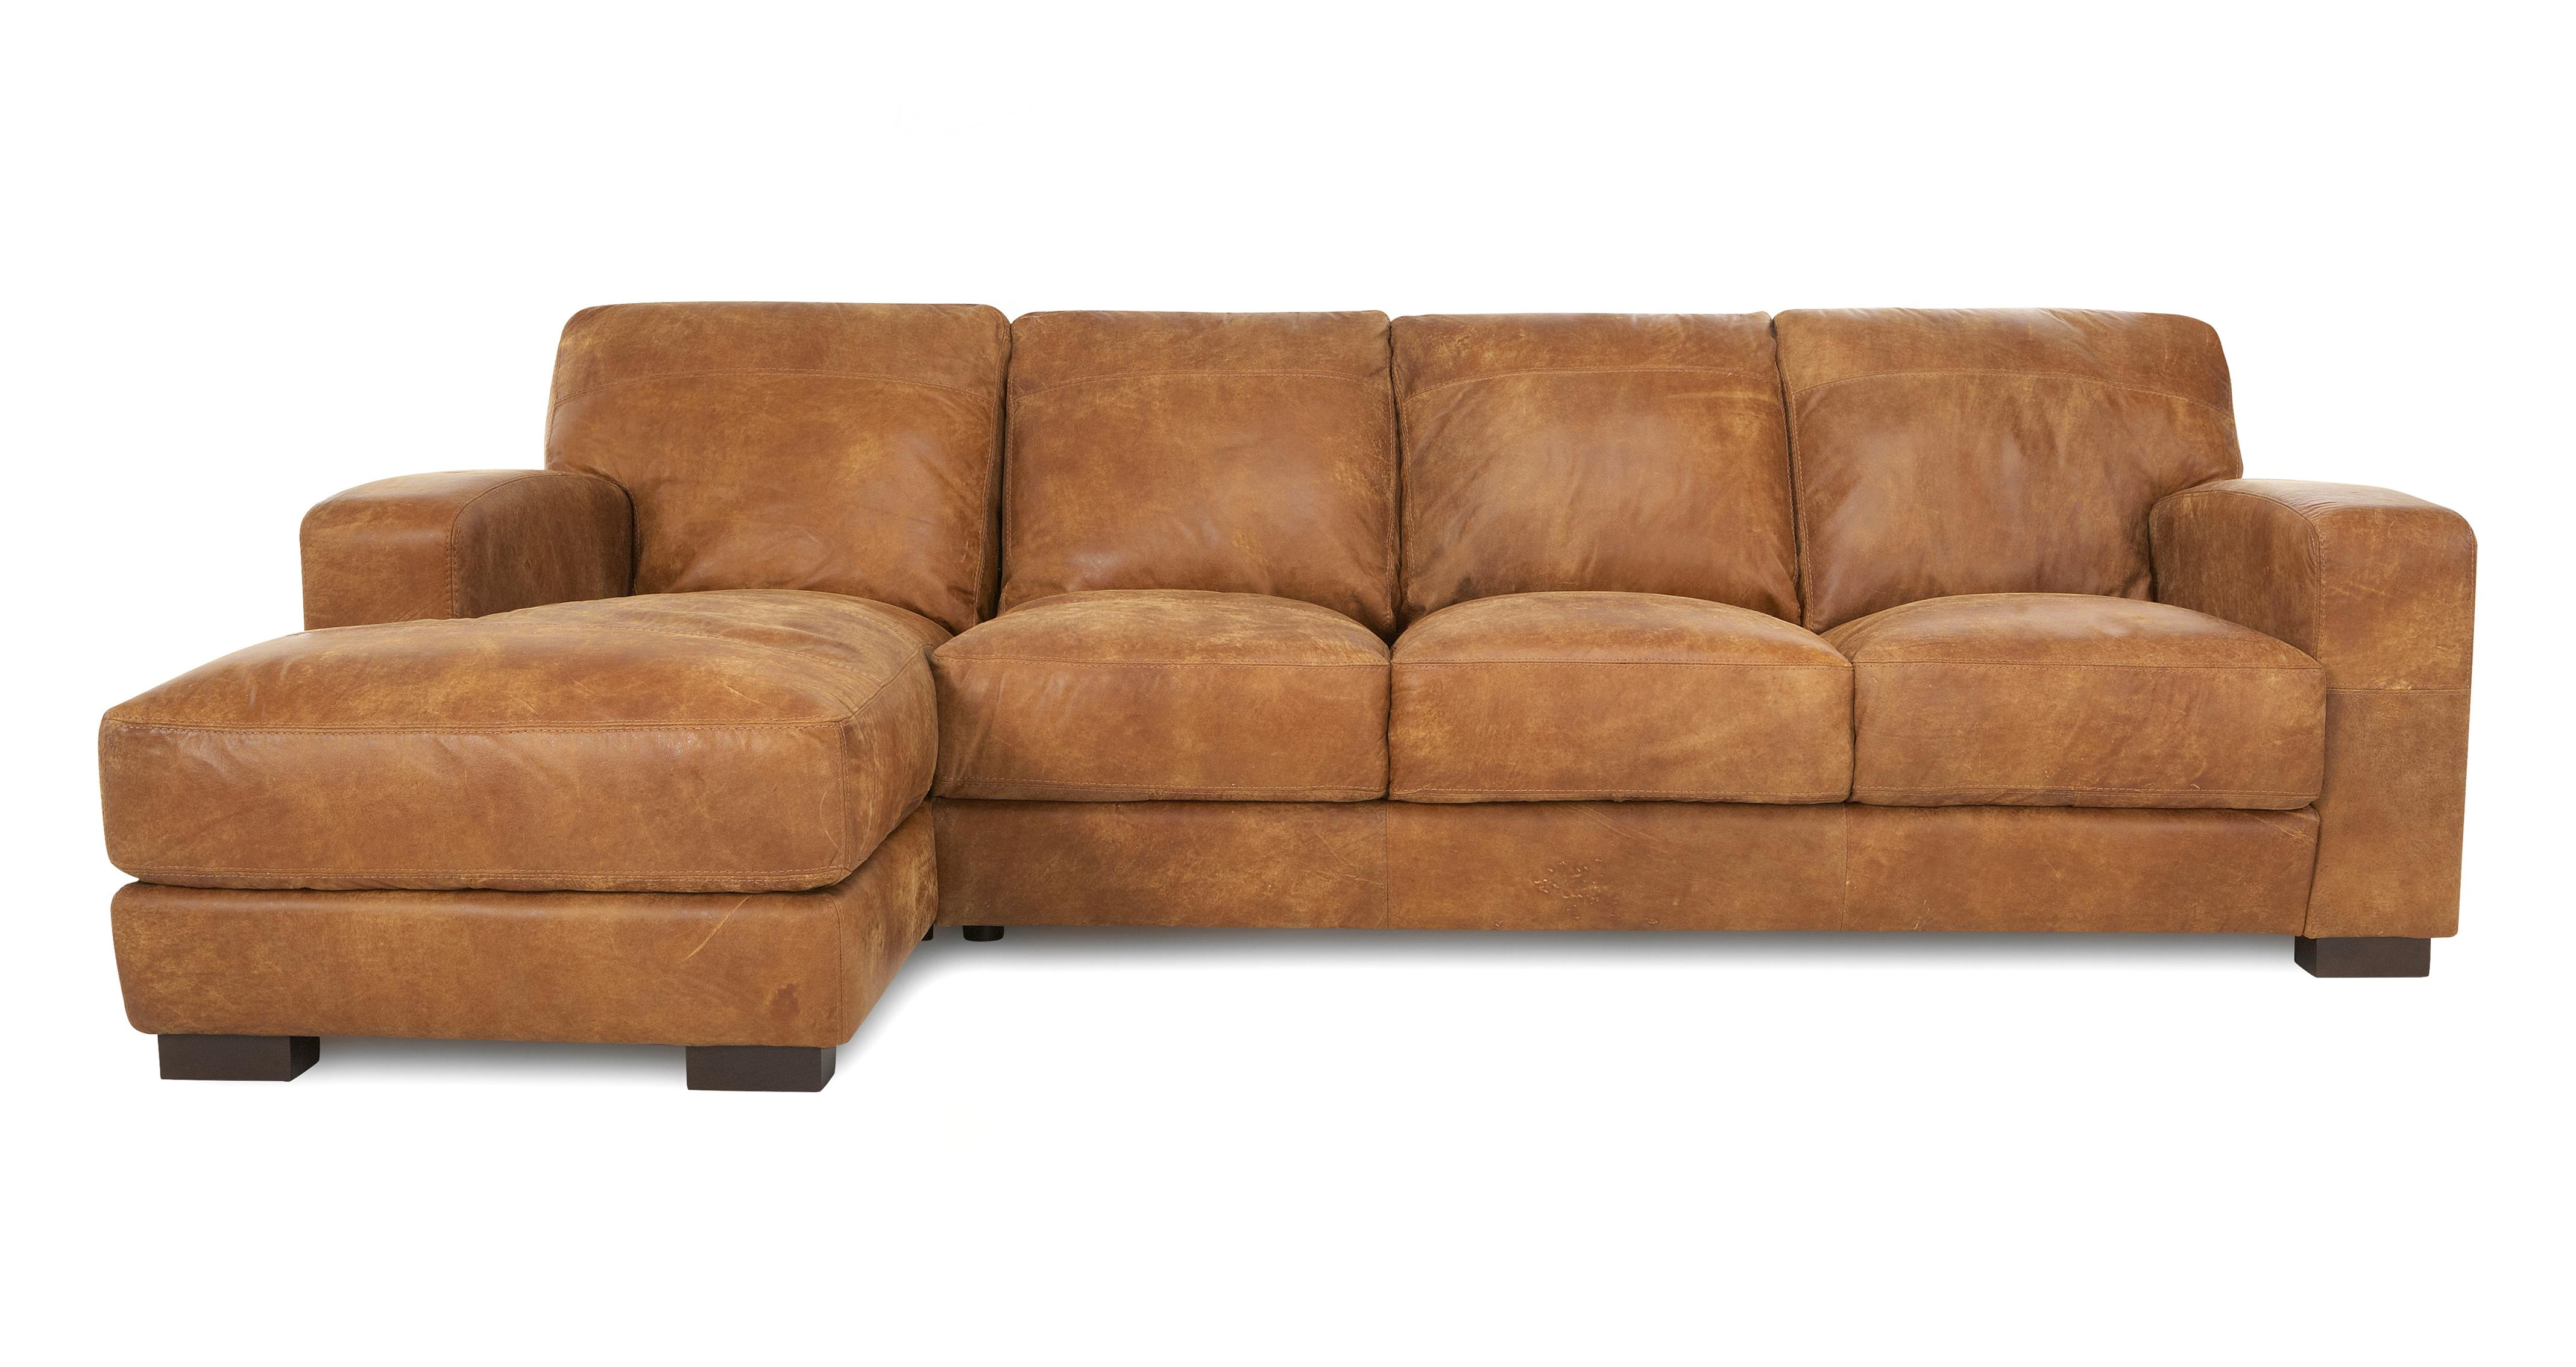 large chaise sofa dfs upholstery near me caesar leather energywarden